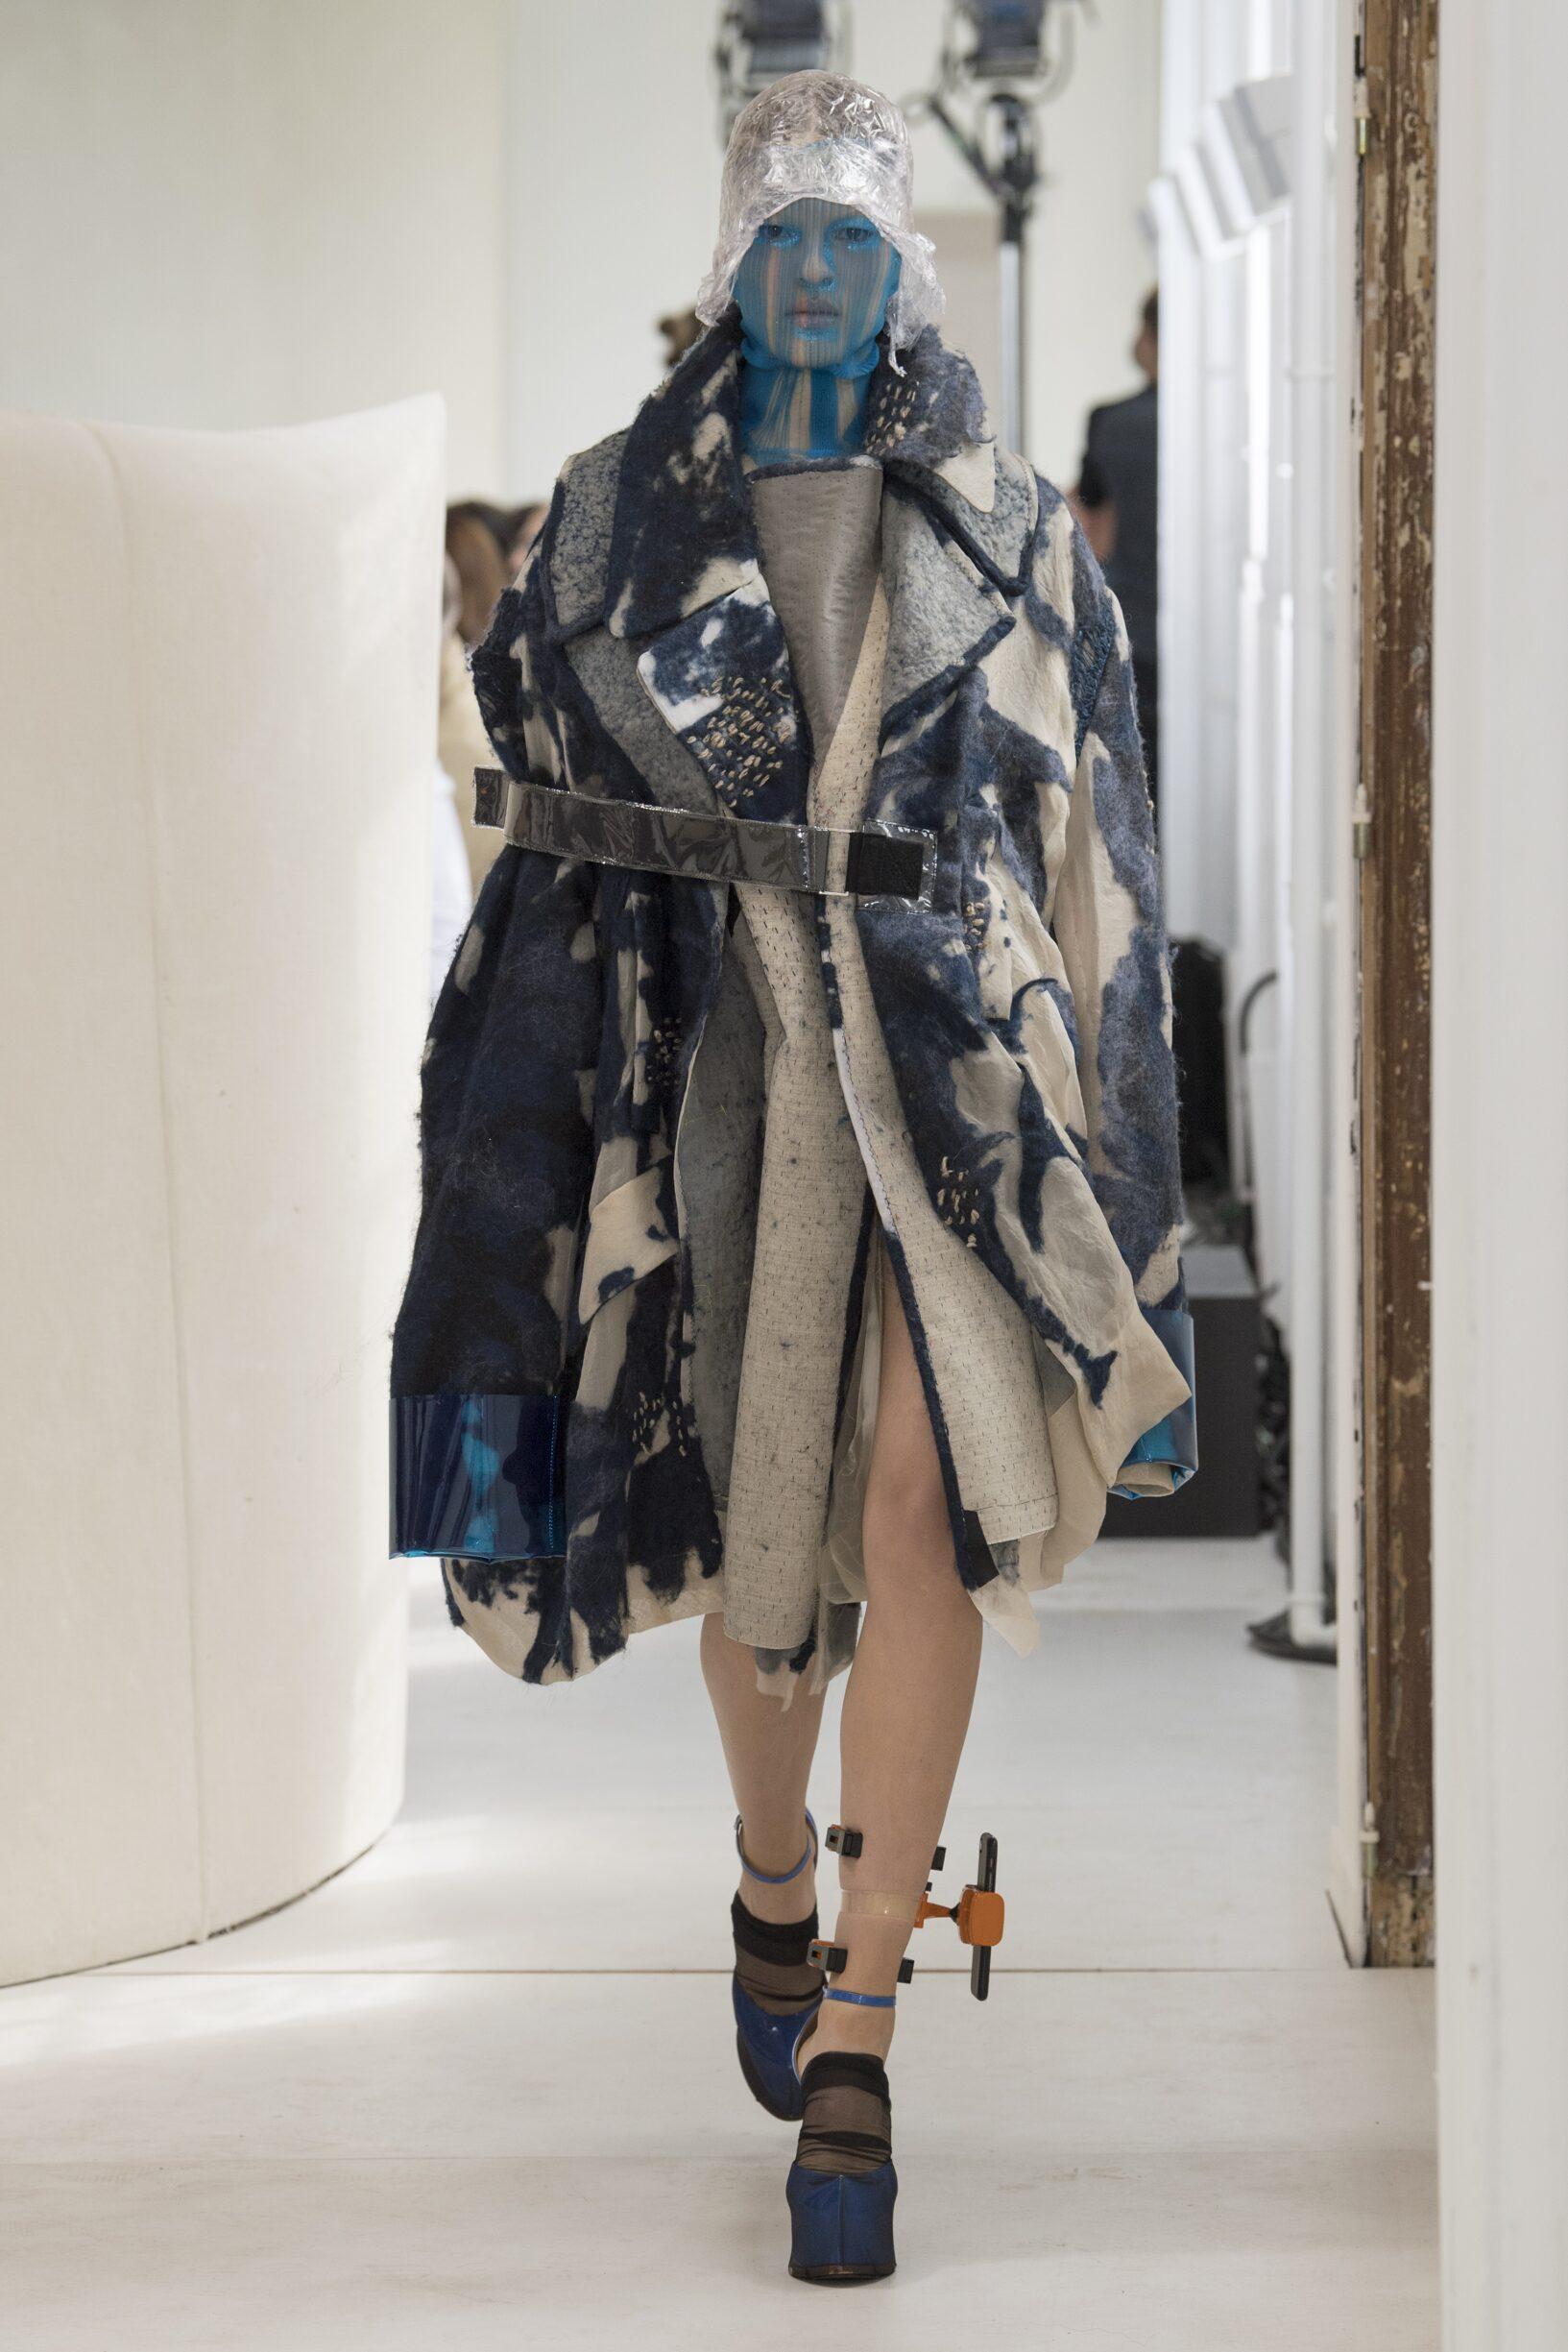 Runway Maison Margiela Artisanal Fall Winter 2018 Women's Collection Paris Fashion Week